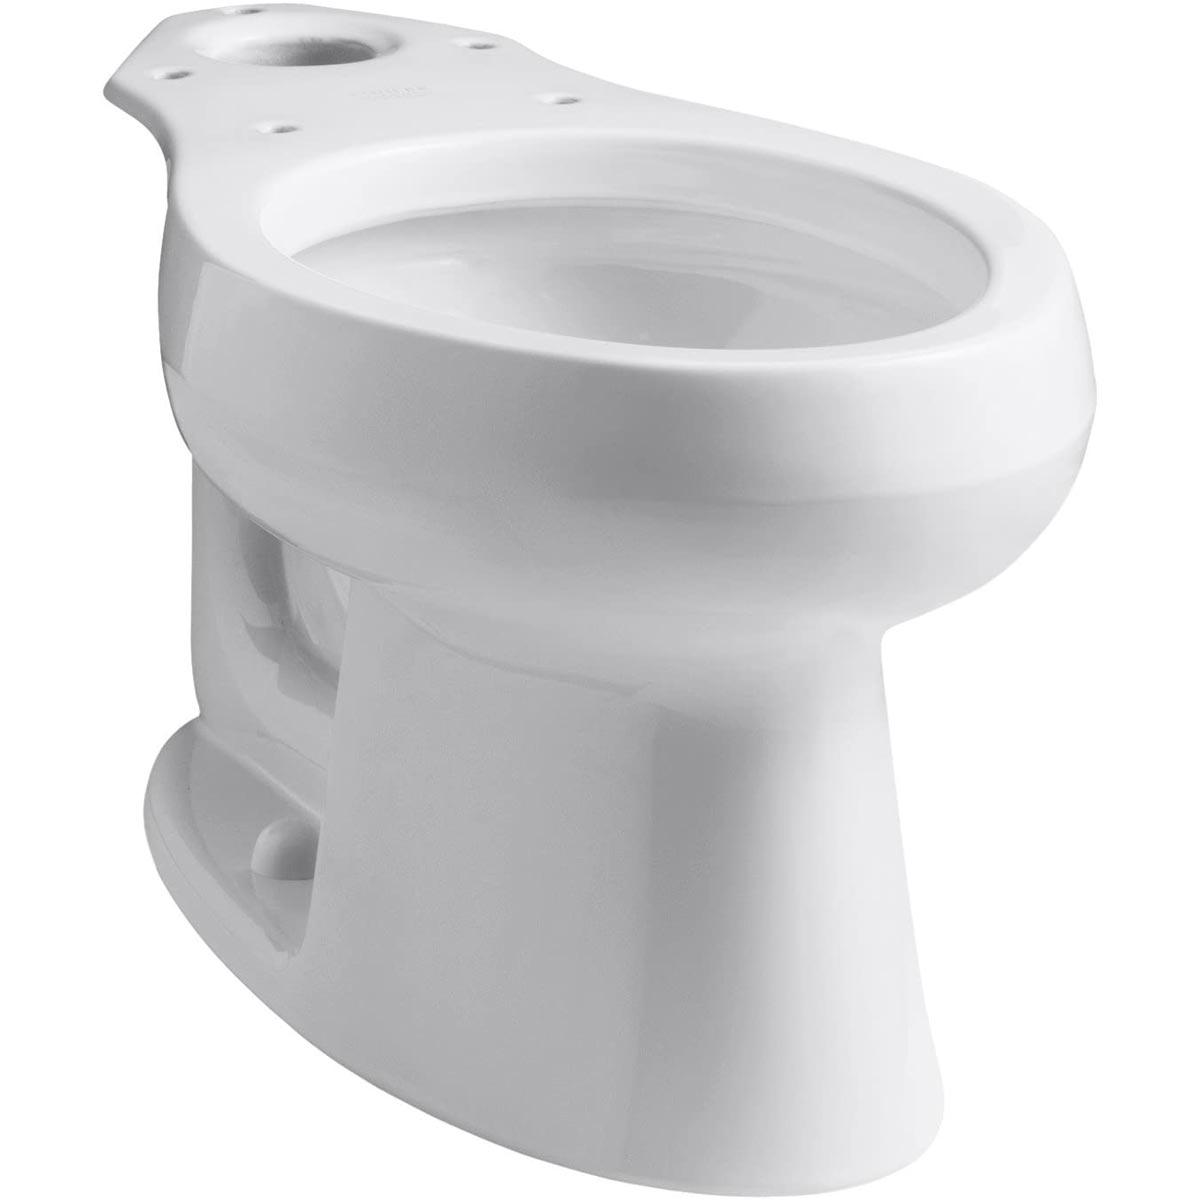 Kohler Wellworth Elongated Toilet Bowl, White